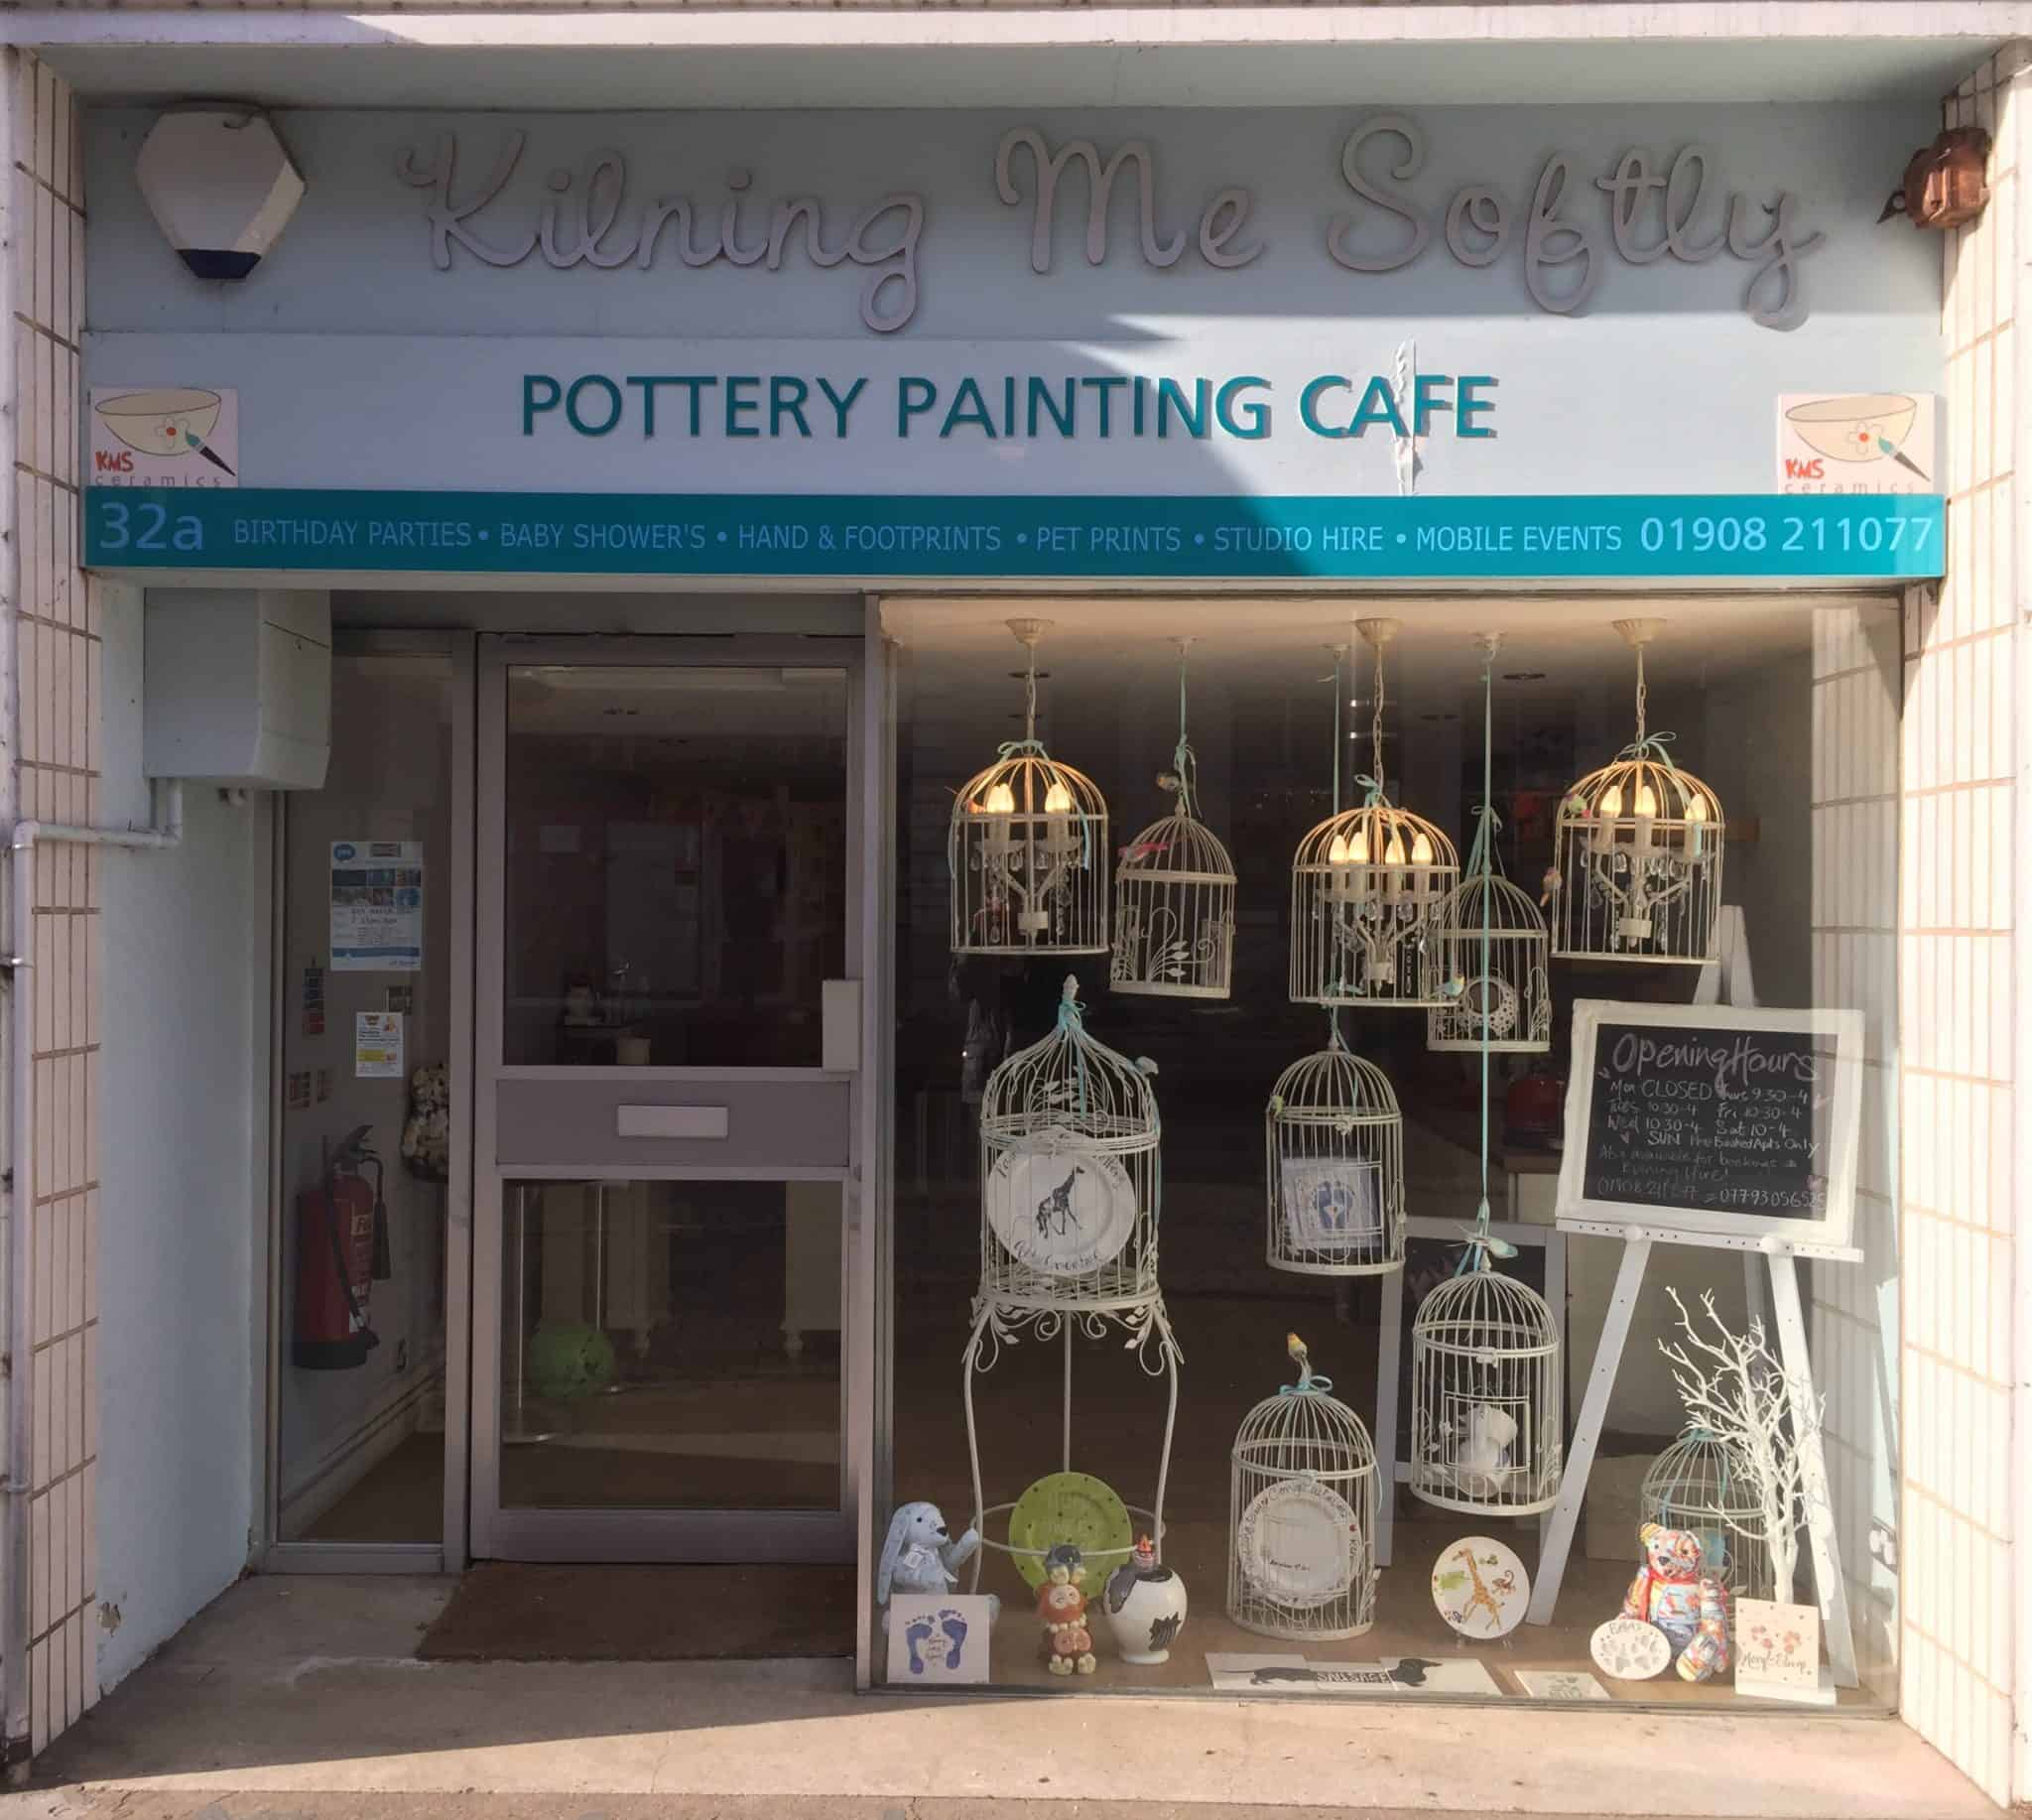 Kilning Me Softly Pottery Painting Cafe.